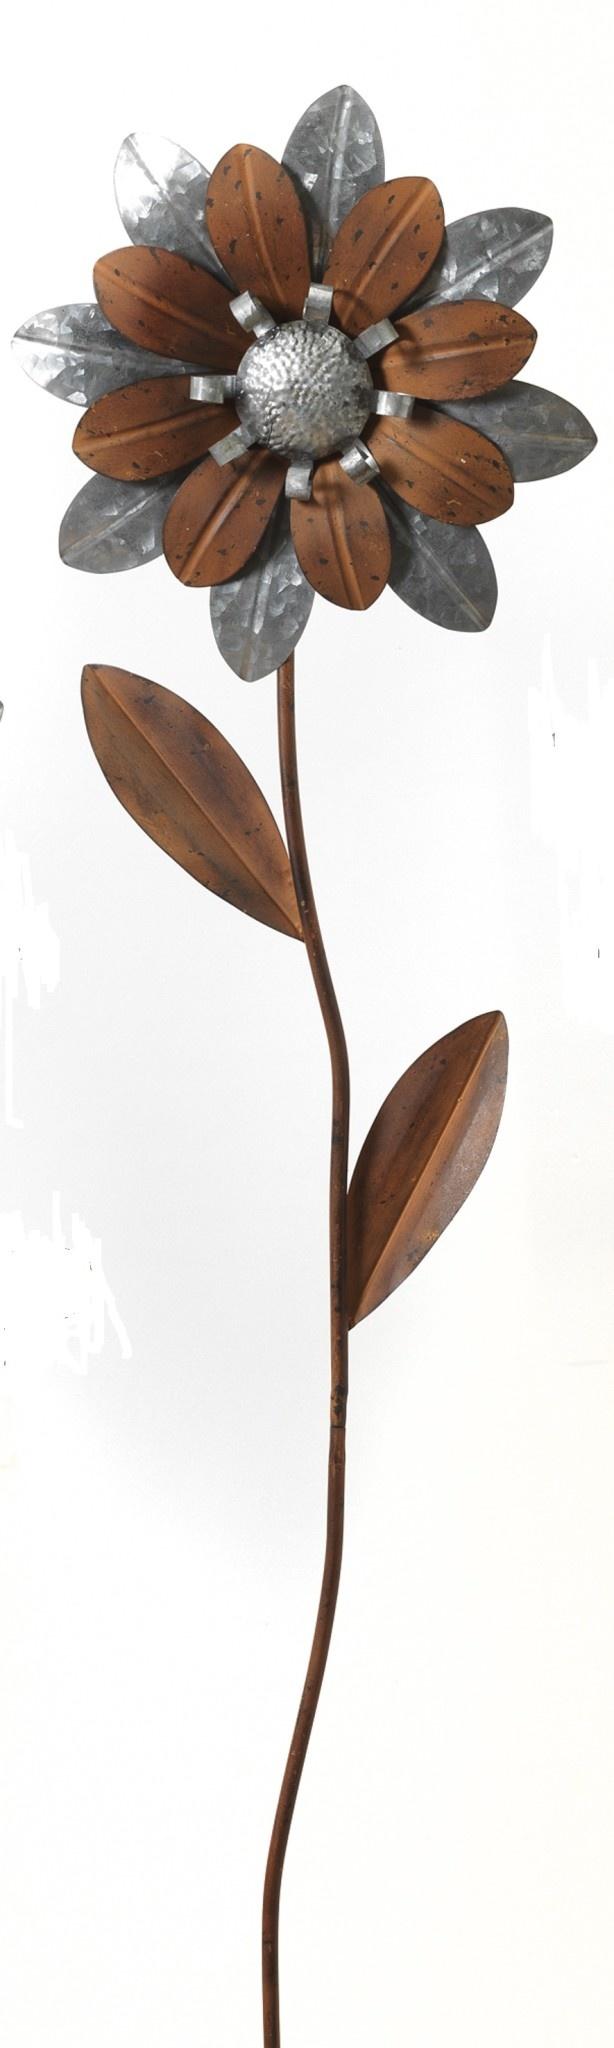 Brown & Silver Flower Stake